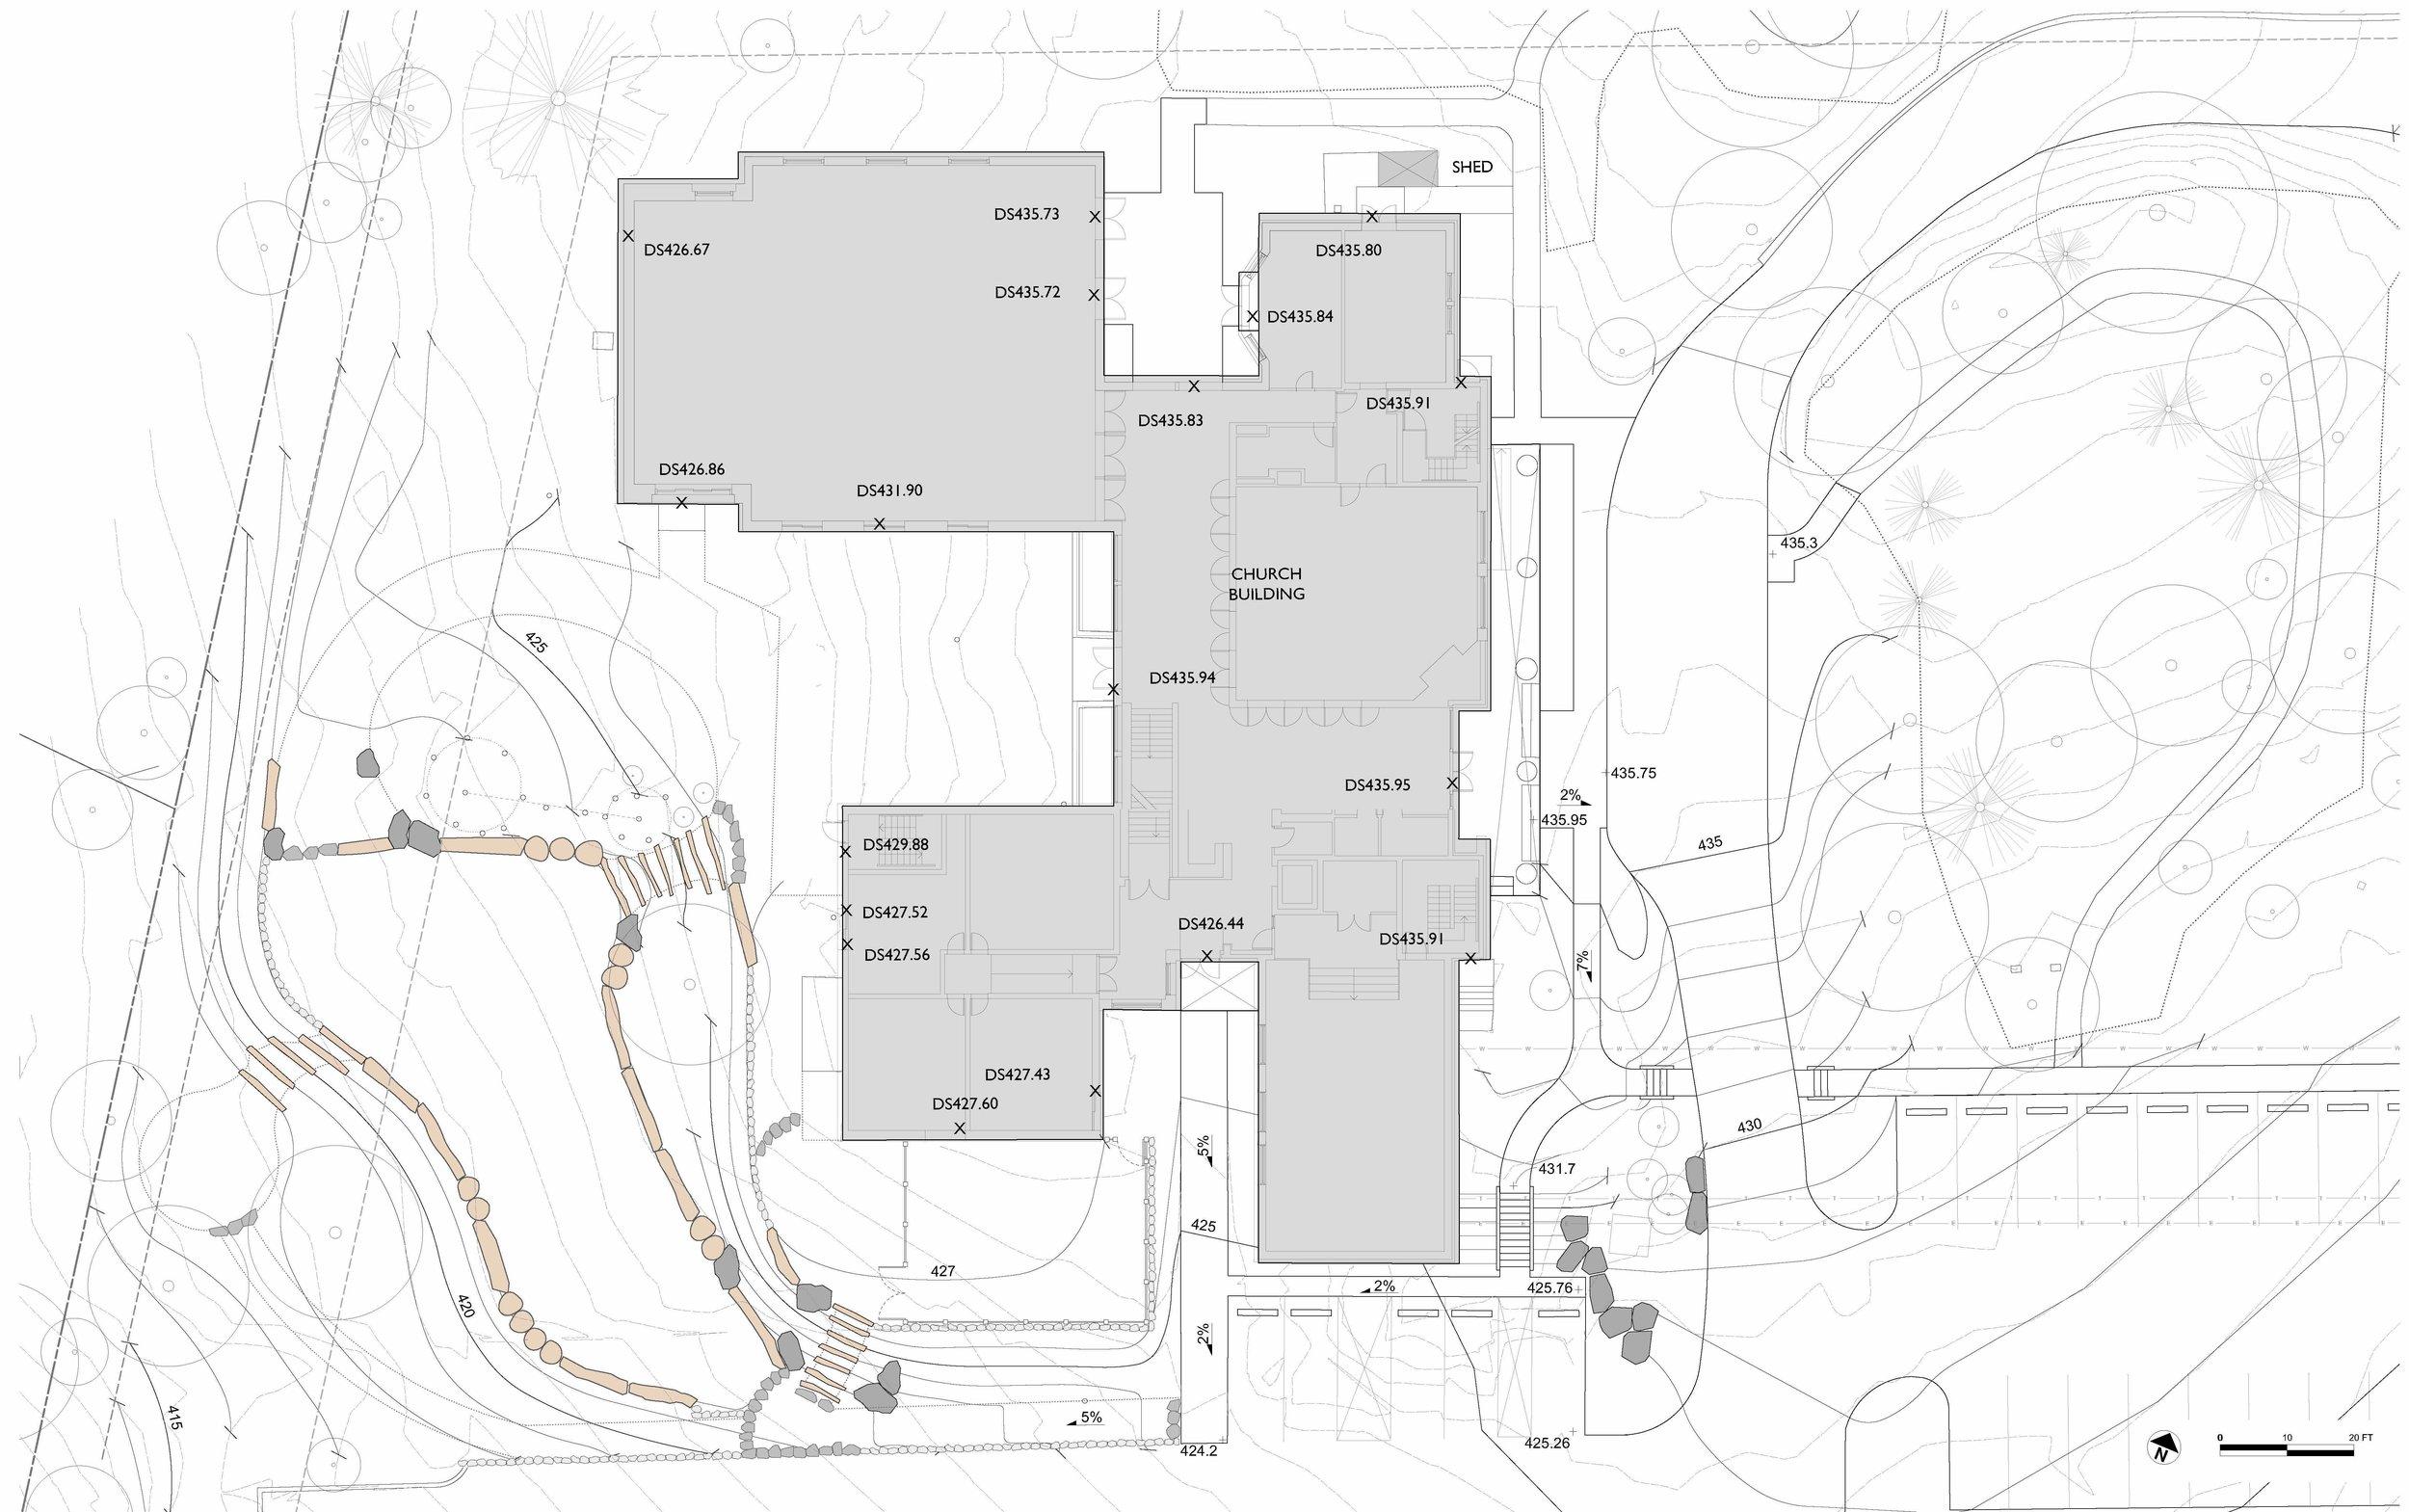 Grading & Drainage Plan - Enlarged.jpg